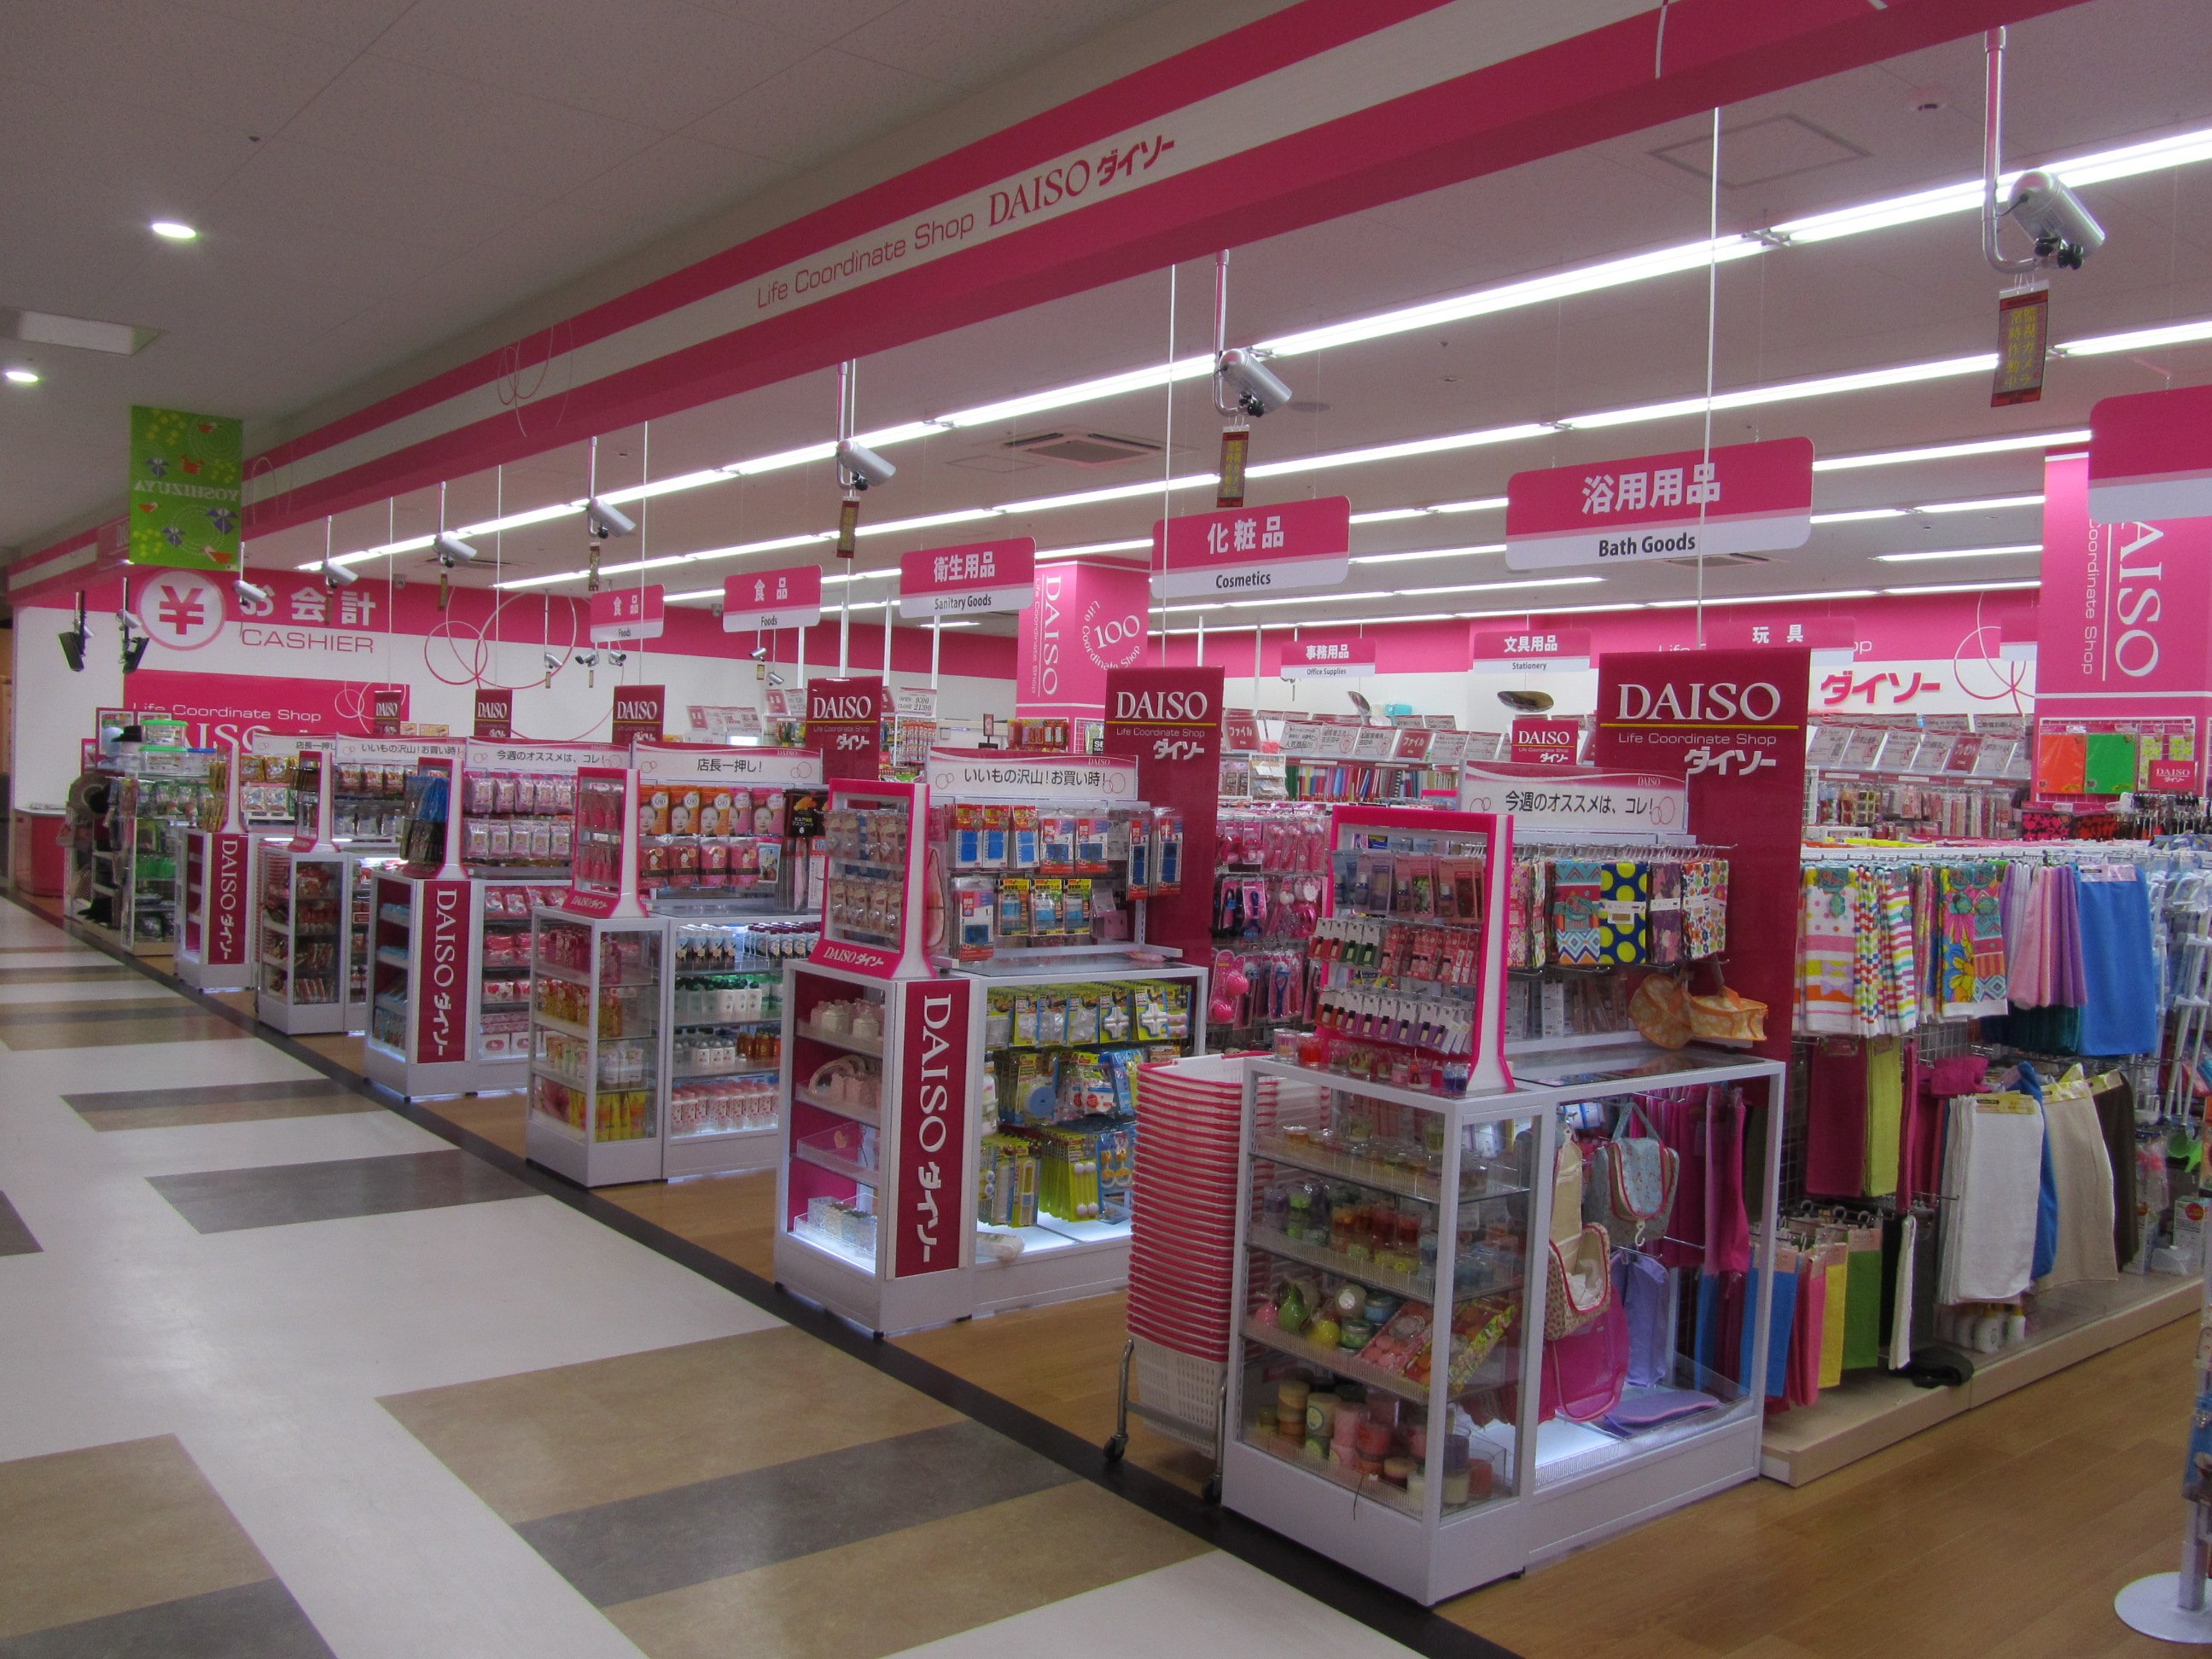 a114c0cd720e6a5a1154fba23cc22487.jpg?resize=300,169 - ダイソーの商品一覧を把握して店舗巡りをしよう!